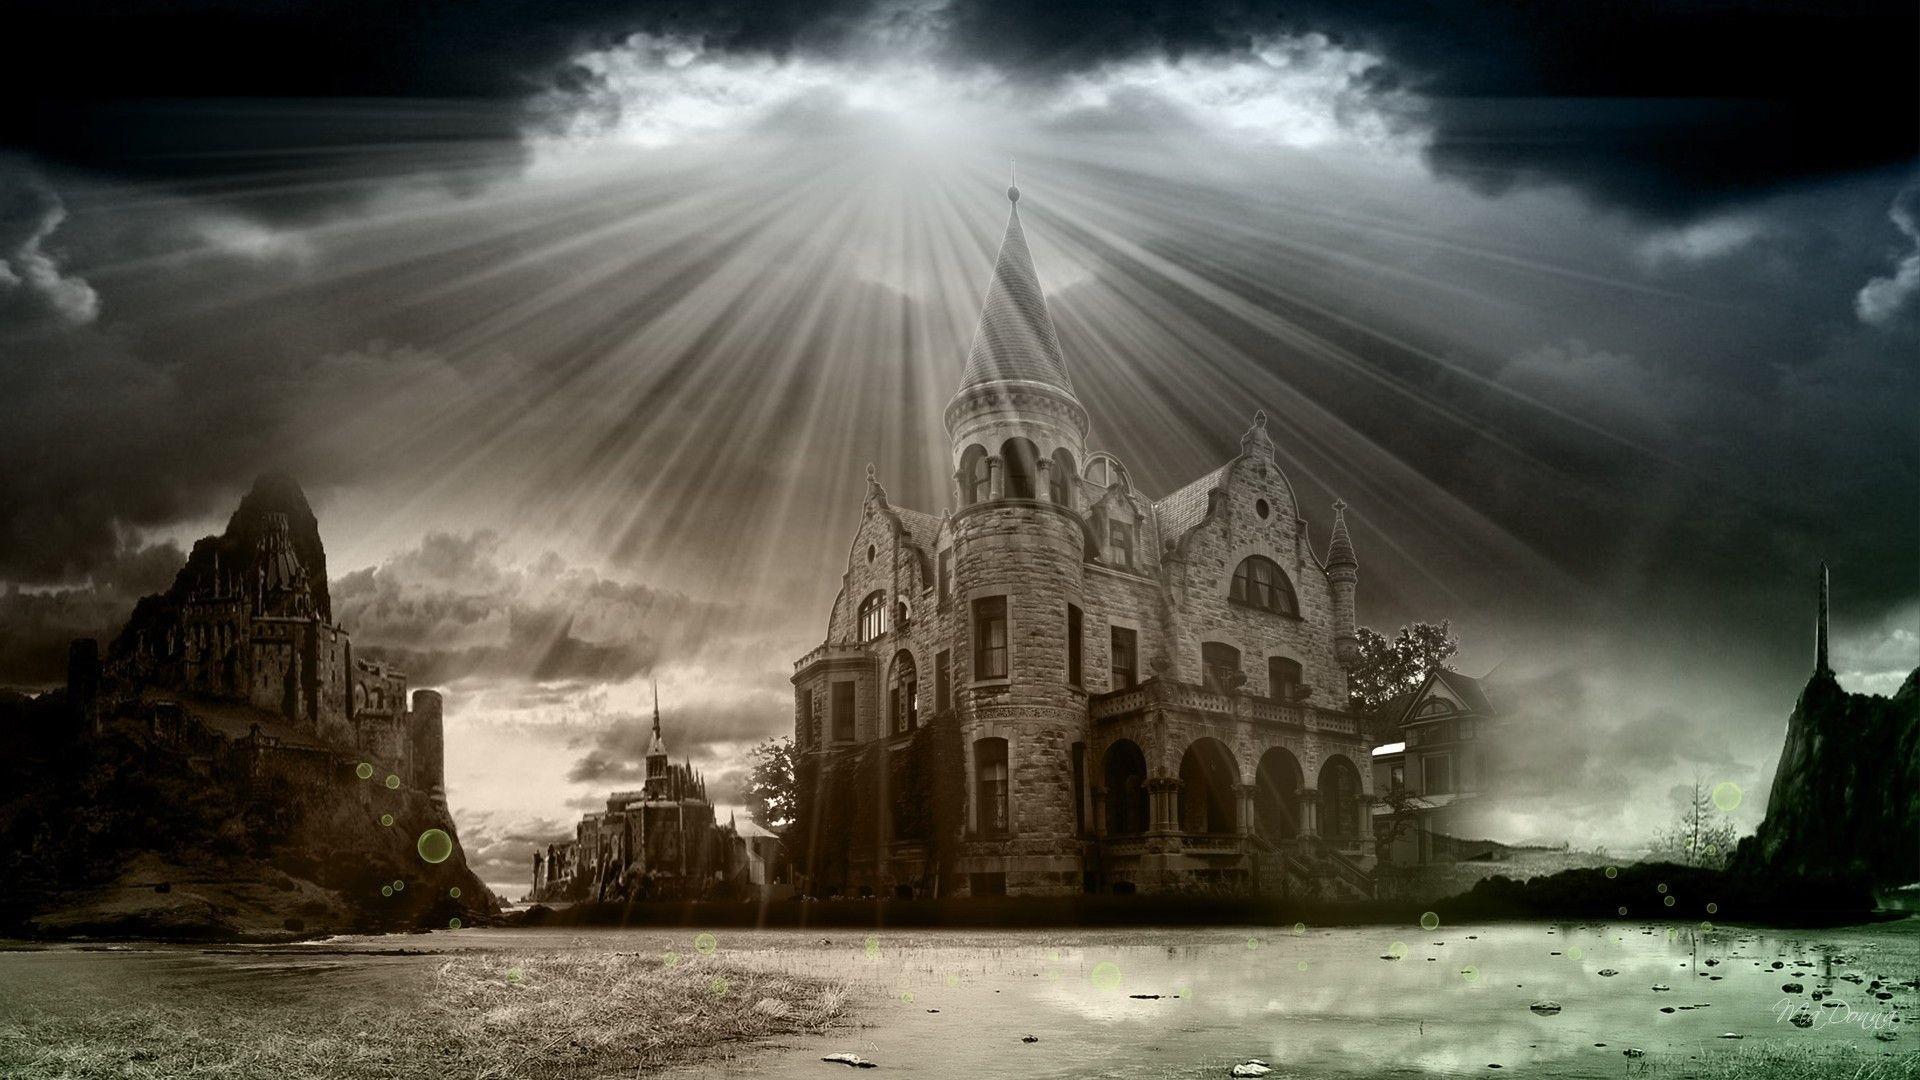 Gothic Castle Wallpaper for pc